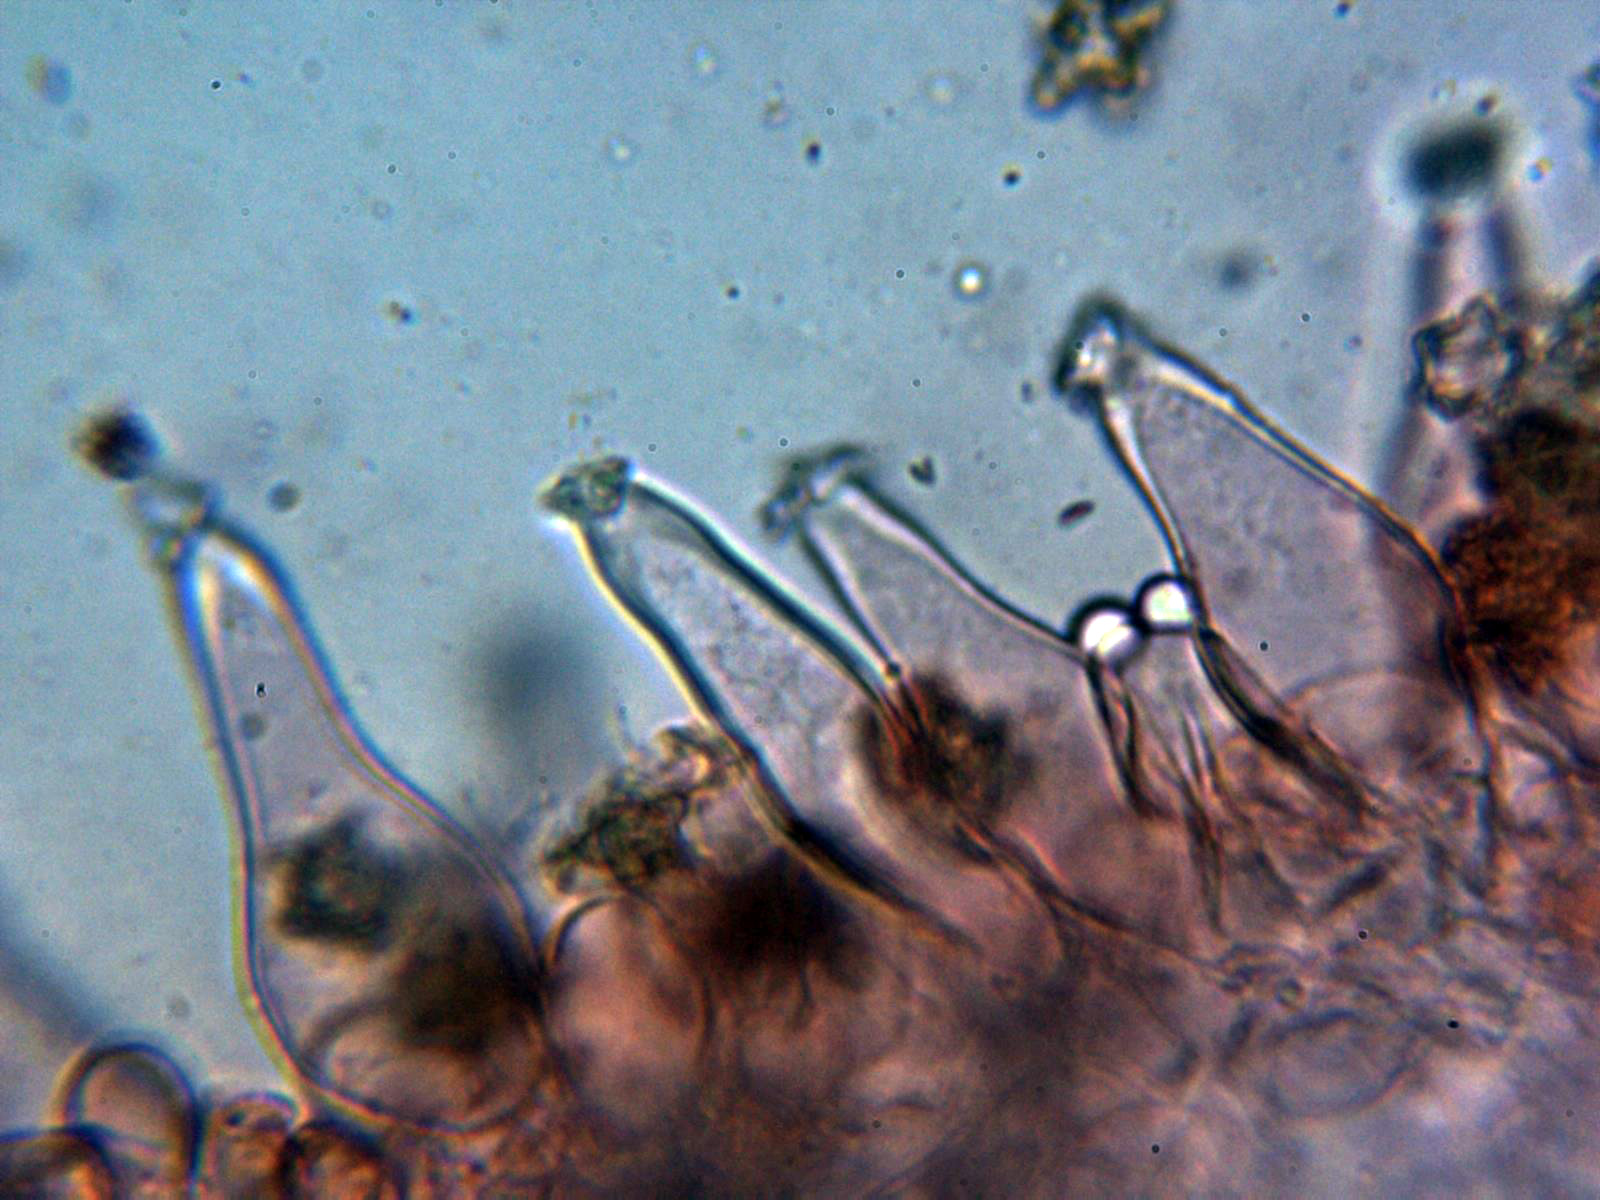 5-Queilocistidios1.jpg